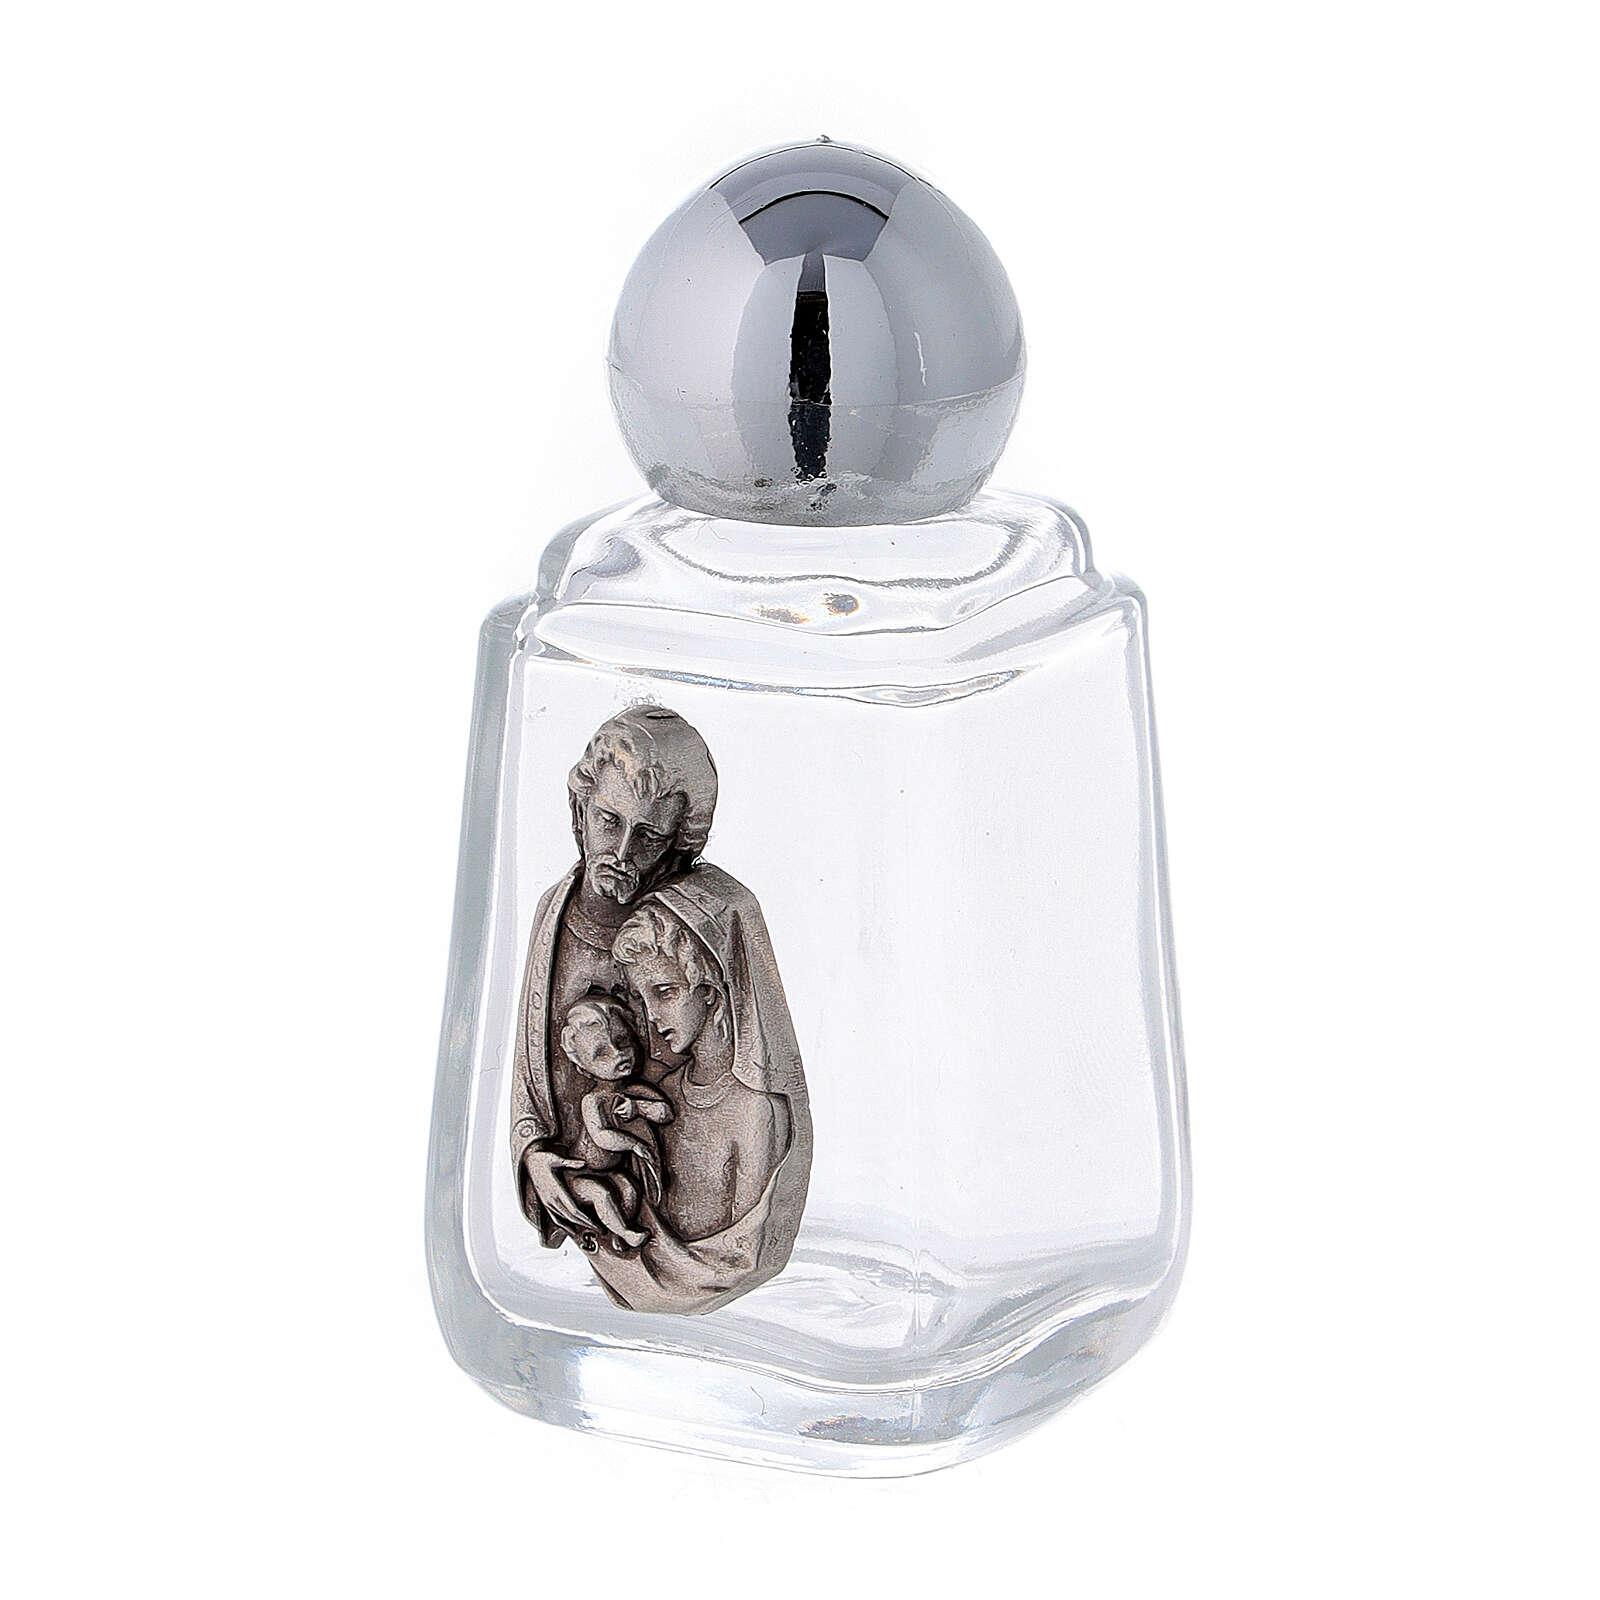 Botella agua bendita Sagrada Familia 15 ml (50 PIEZAS) vidrio 3